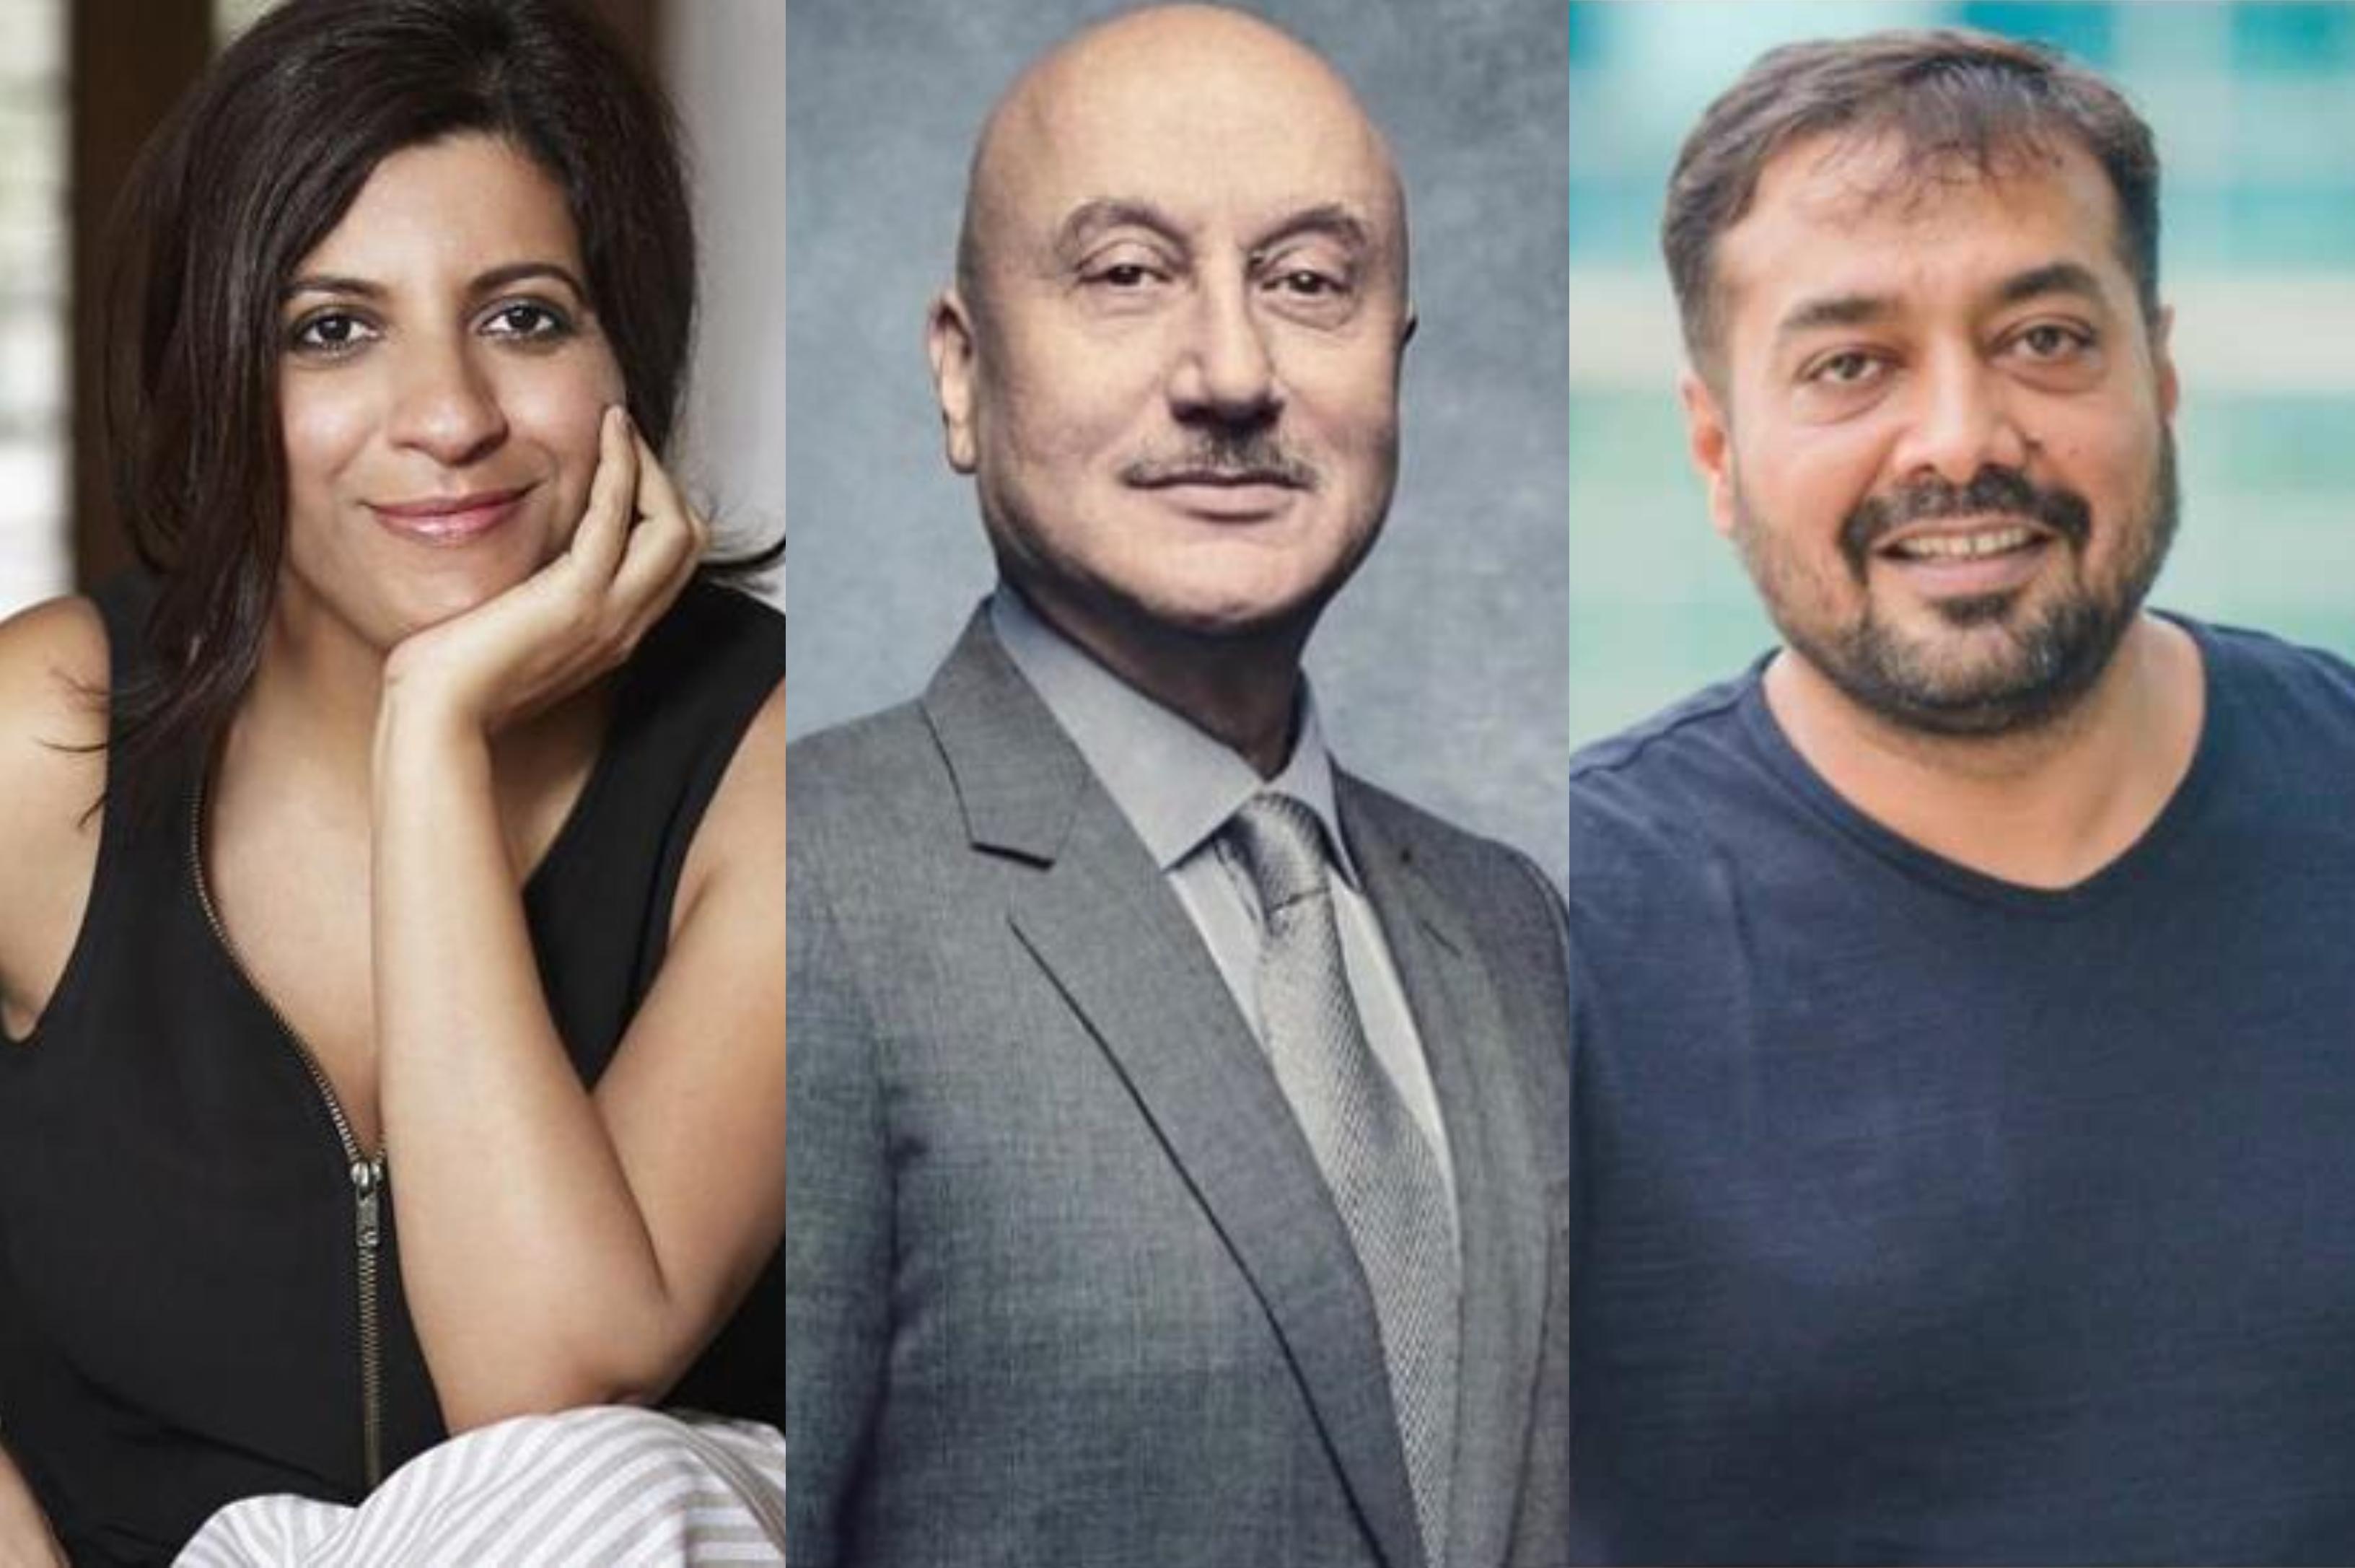 Zoya Akhtar, Anupam Kher, Anurag Kashyap invited to The Academy